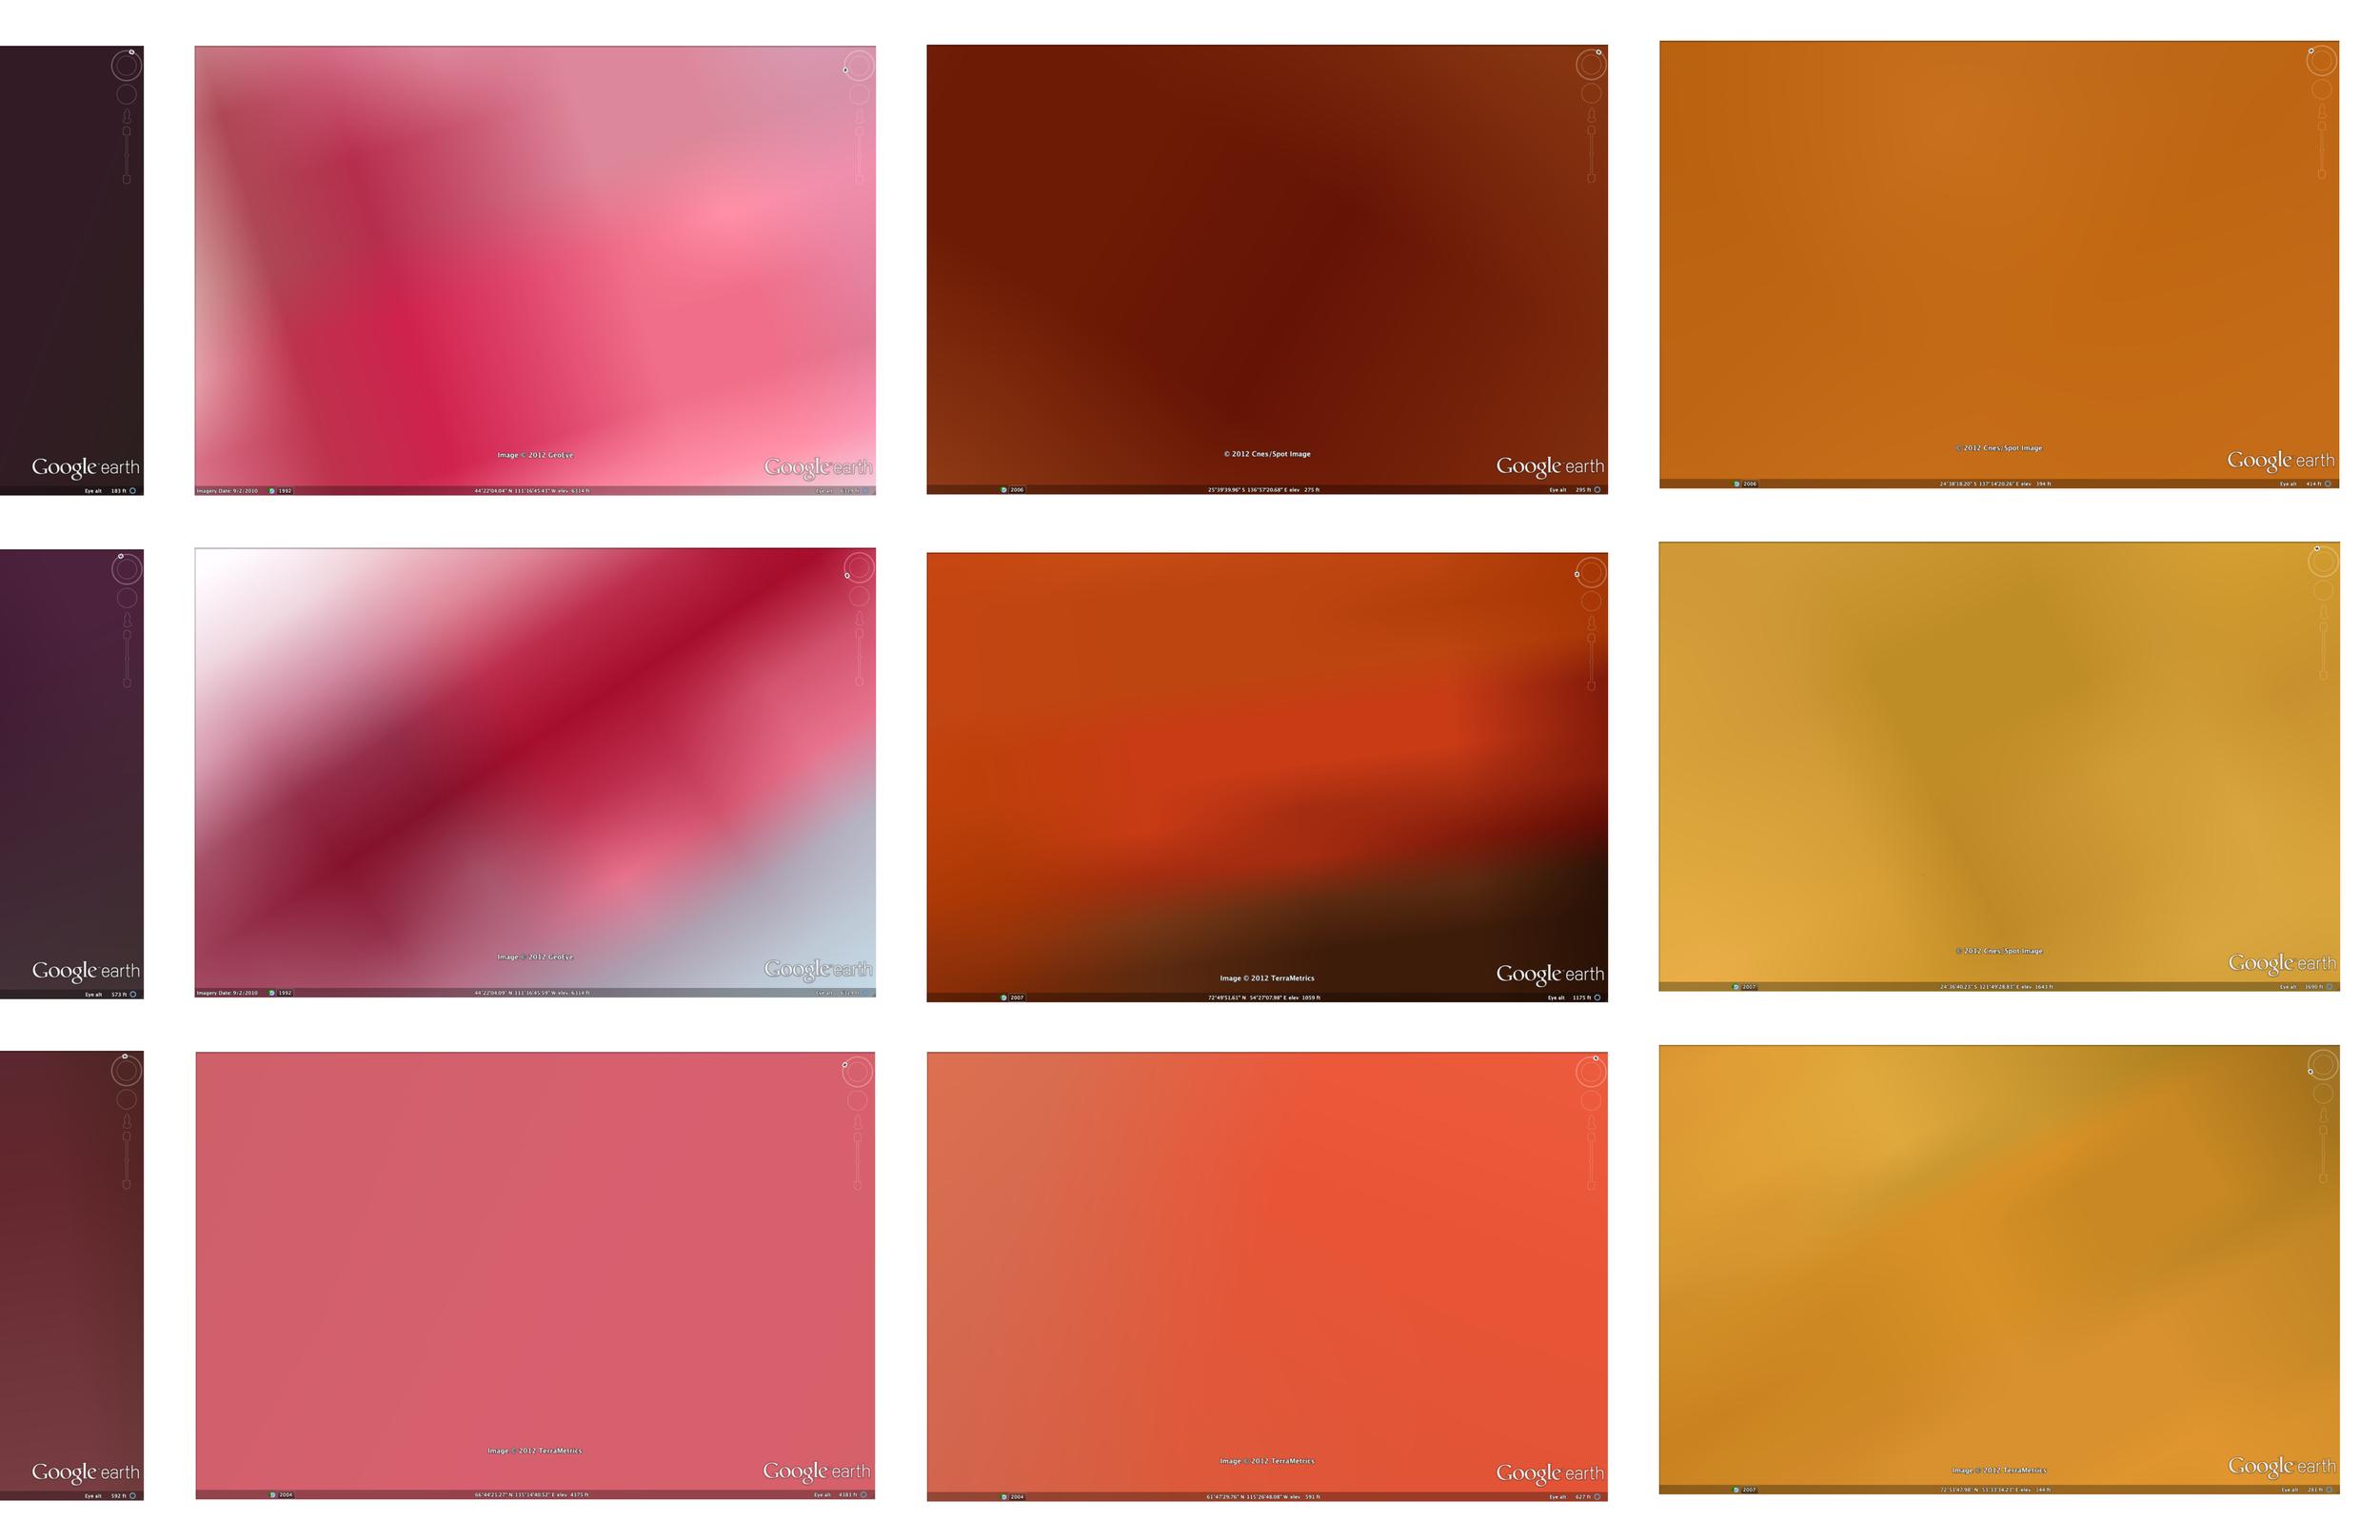 color_spectrum_orange.png